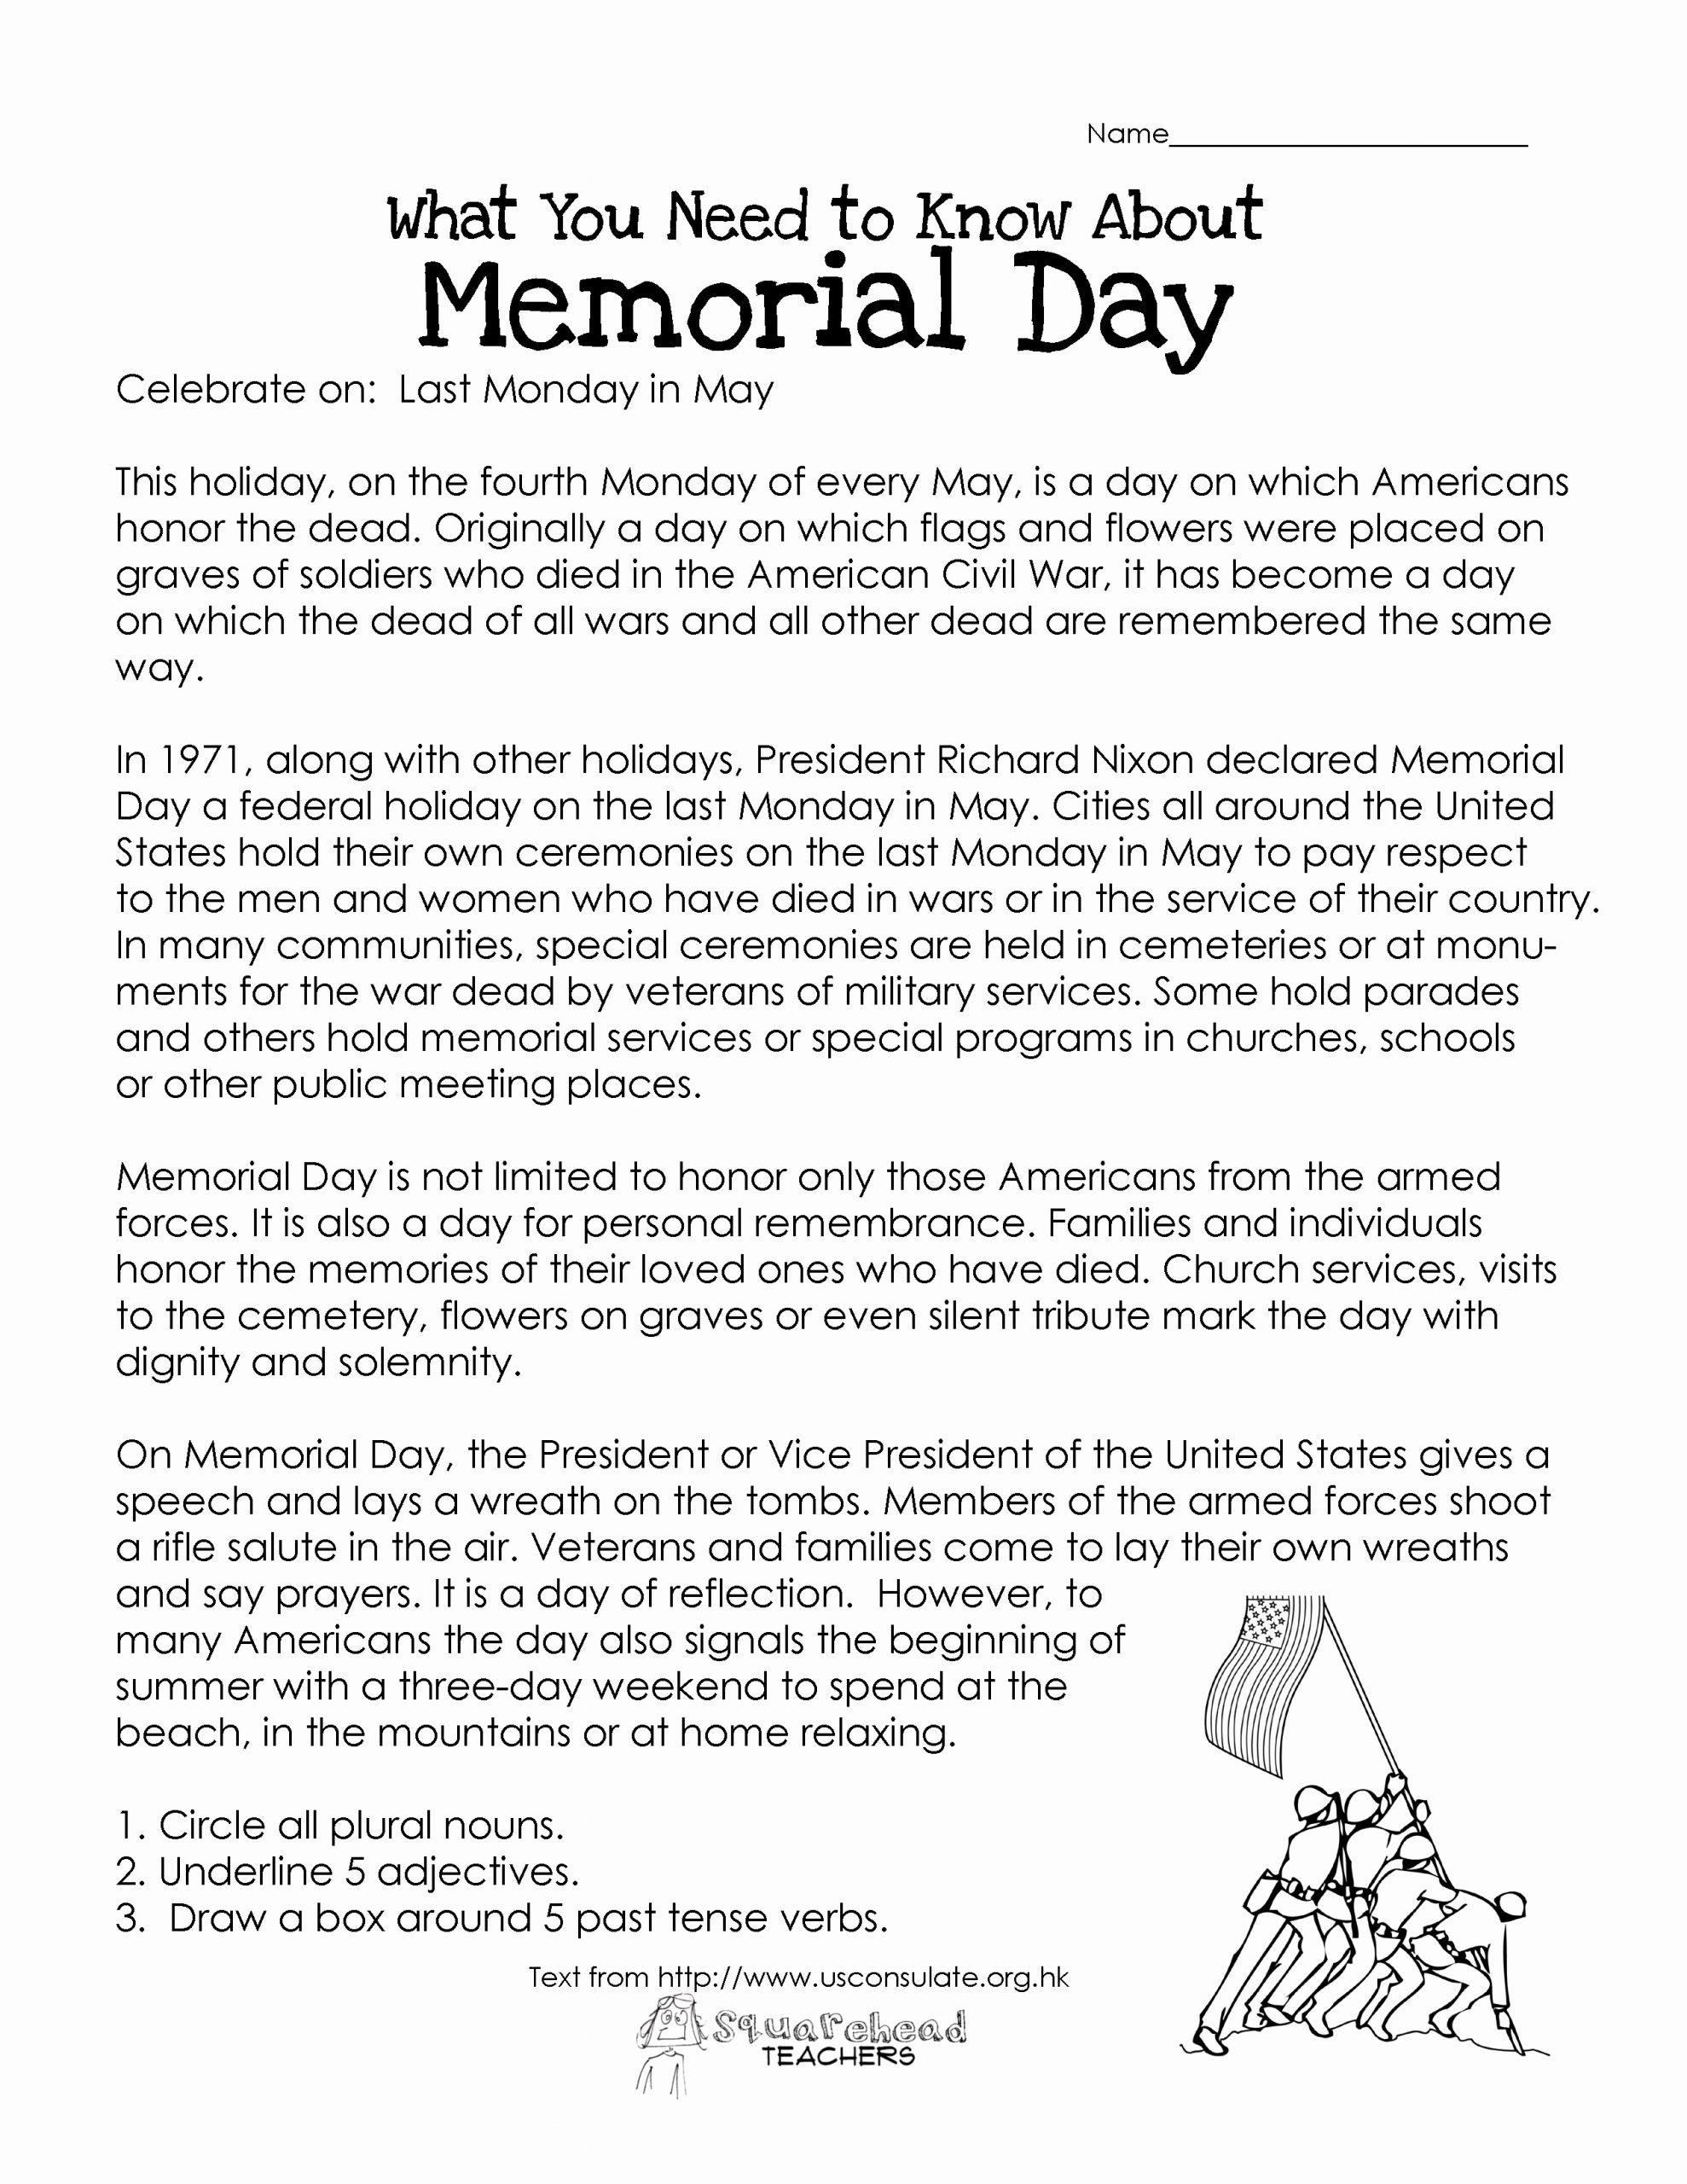 Memorial Day Worksheets for Kids Best Of Memorial Day Free Worksheet